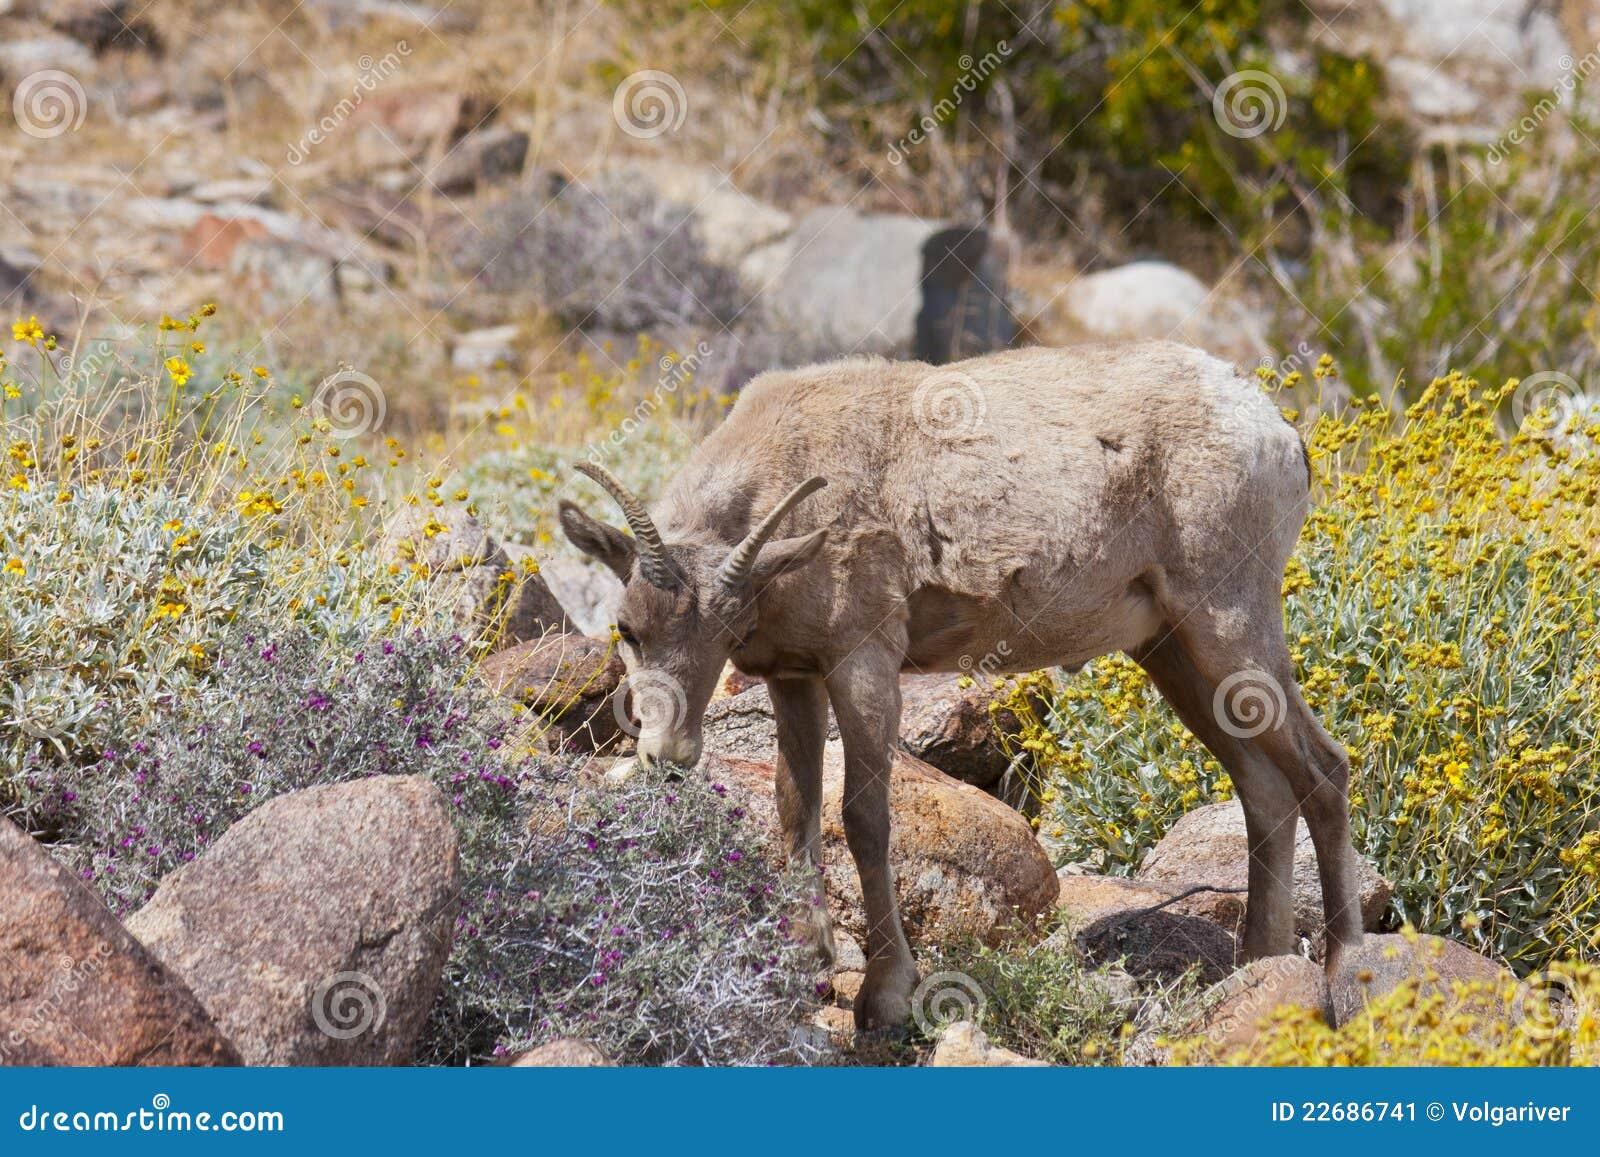 Young Desert Bighorn Sheep in Anza Borrego Desert.